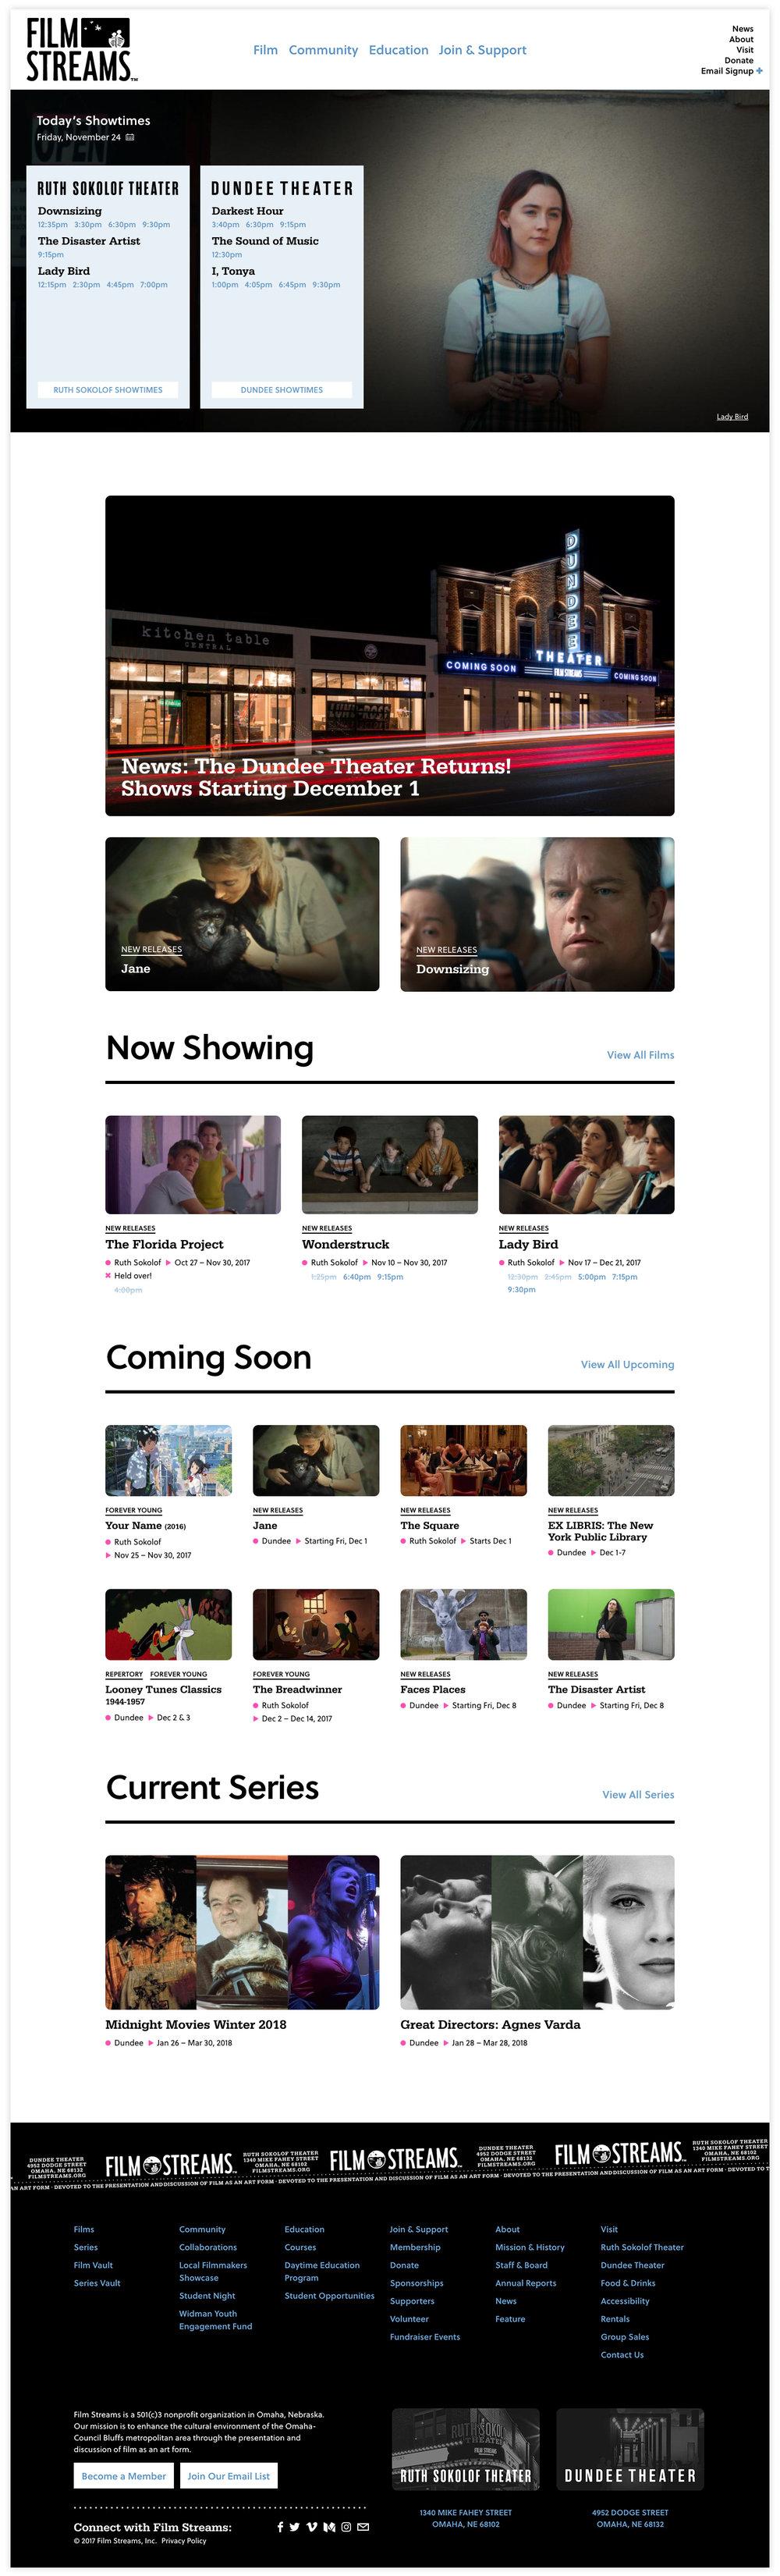 jkdc_filmstreams-home.jpg